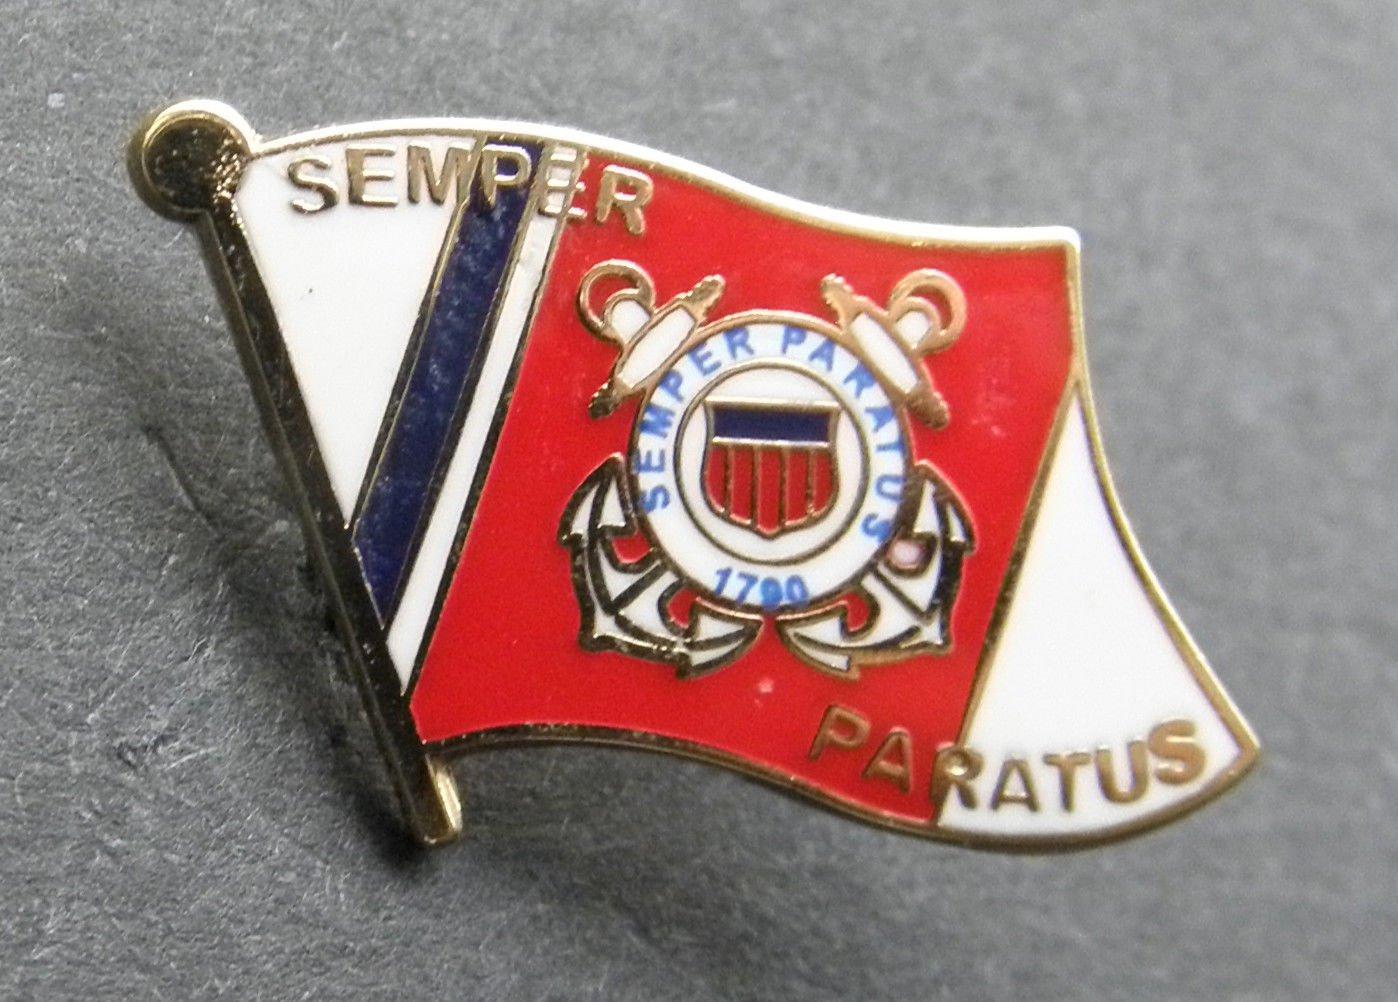 US Coast Guard Semper Paratus Flag Lapel Pin Badge 7/8 Inch